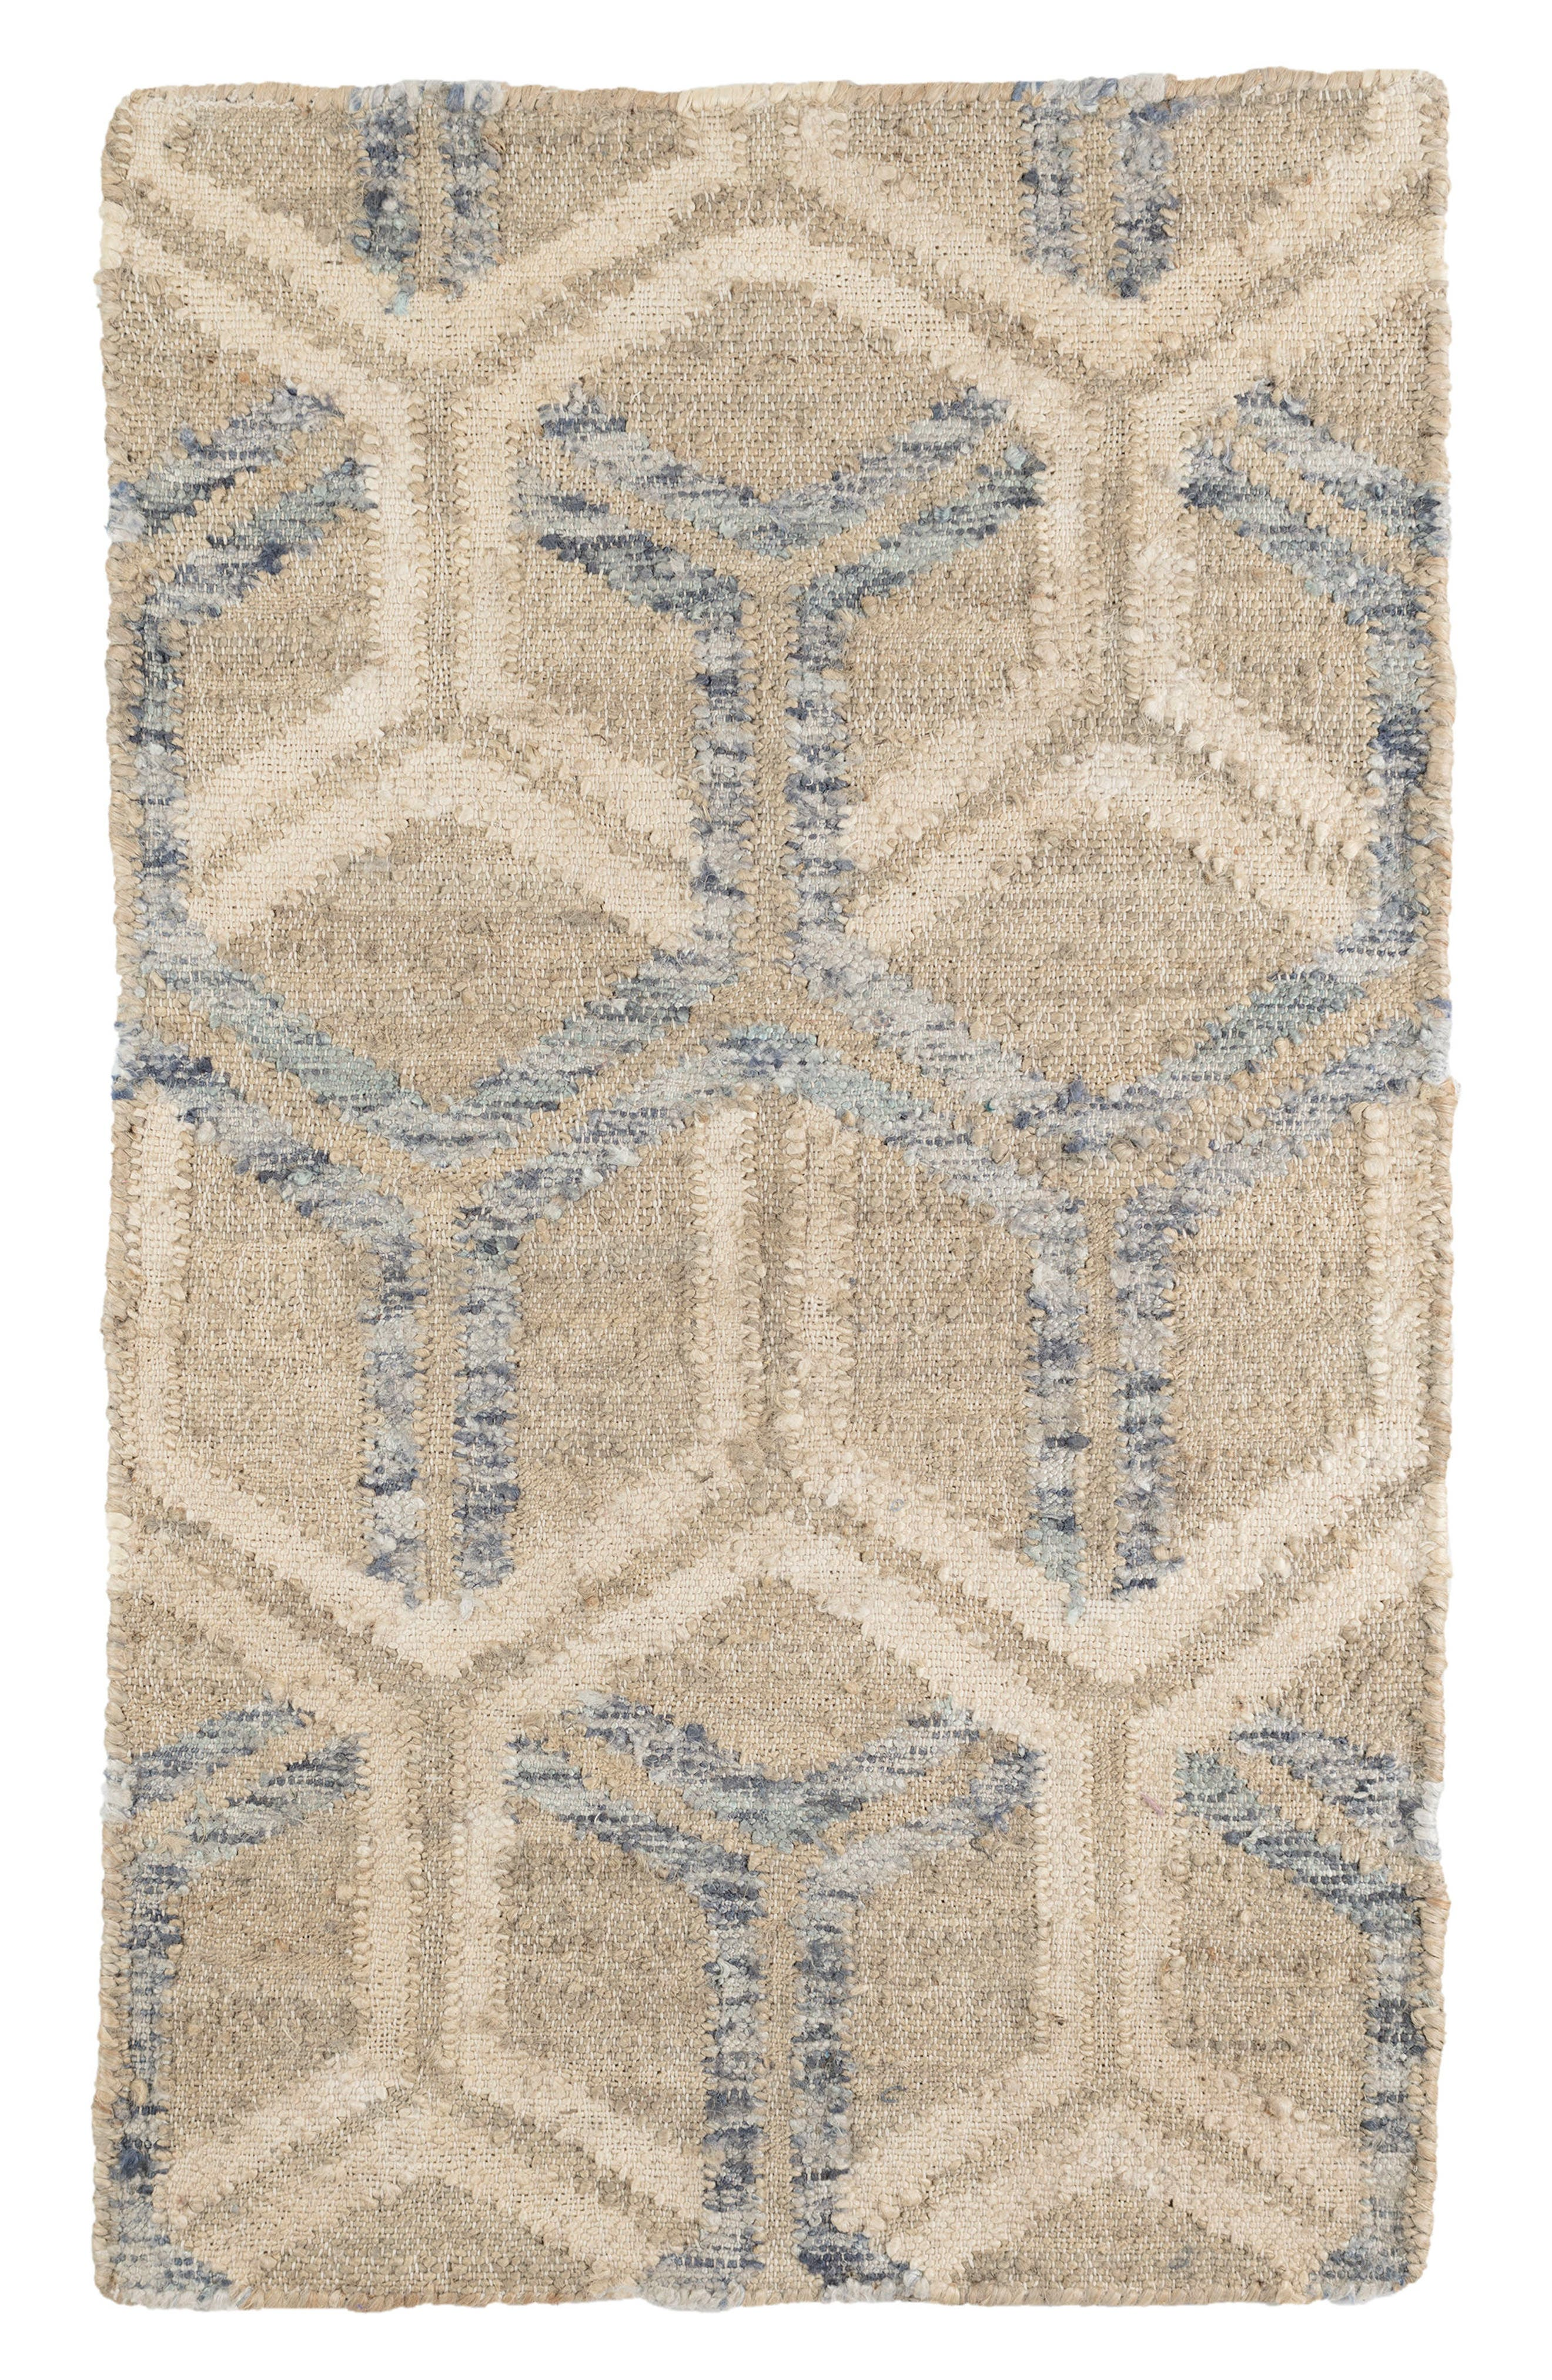 Tala Woven Jute & Cotton Rug,                         Main,                         color, Blue